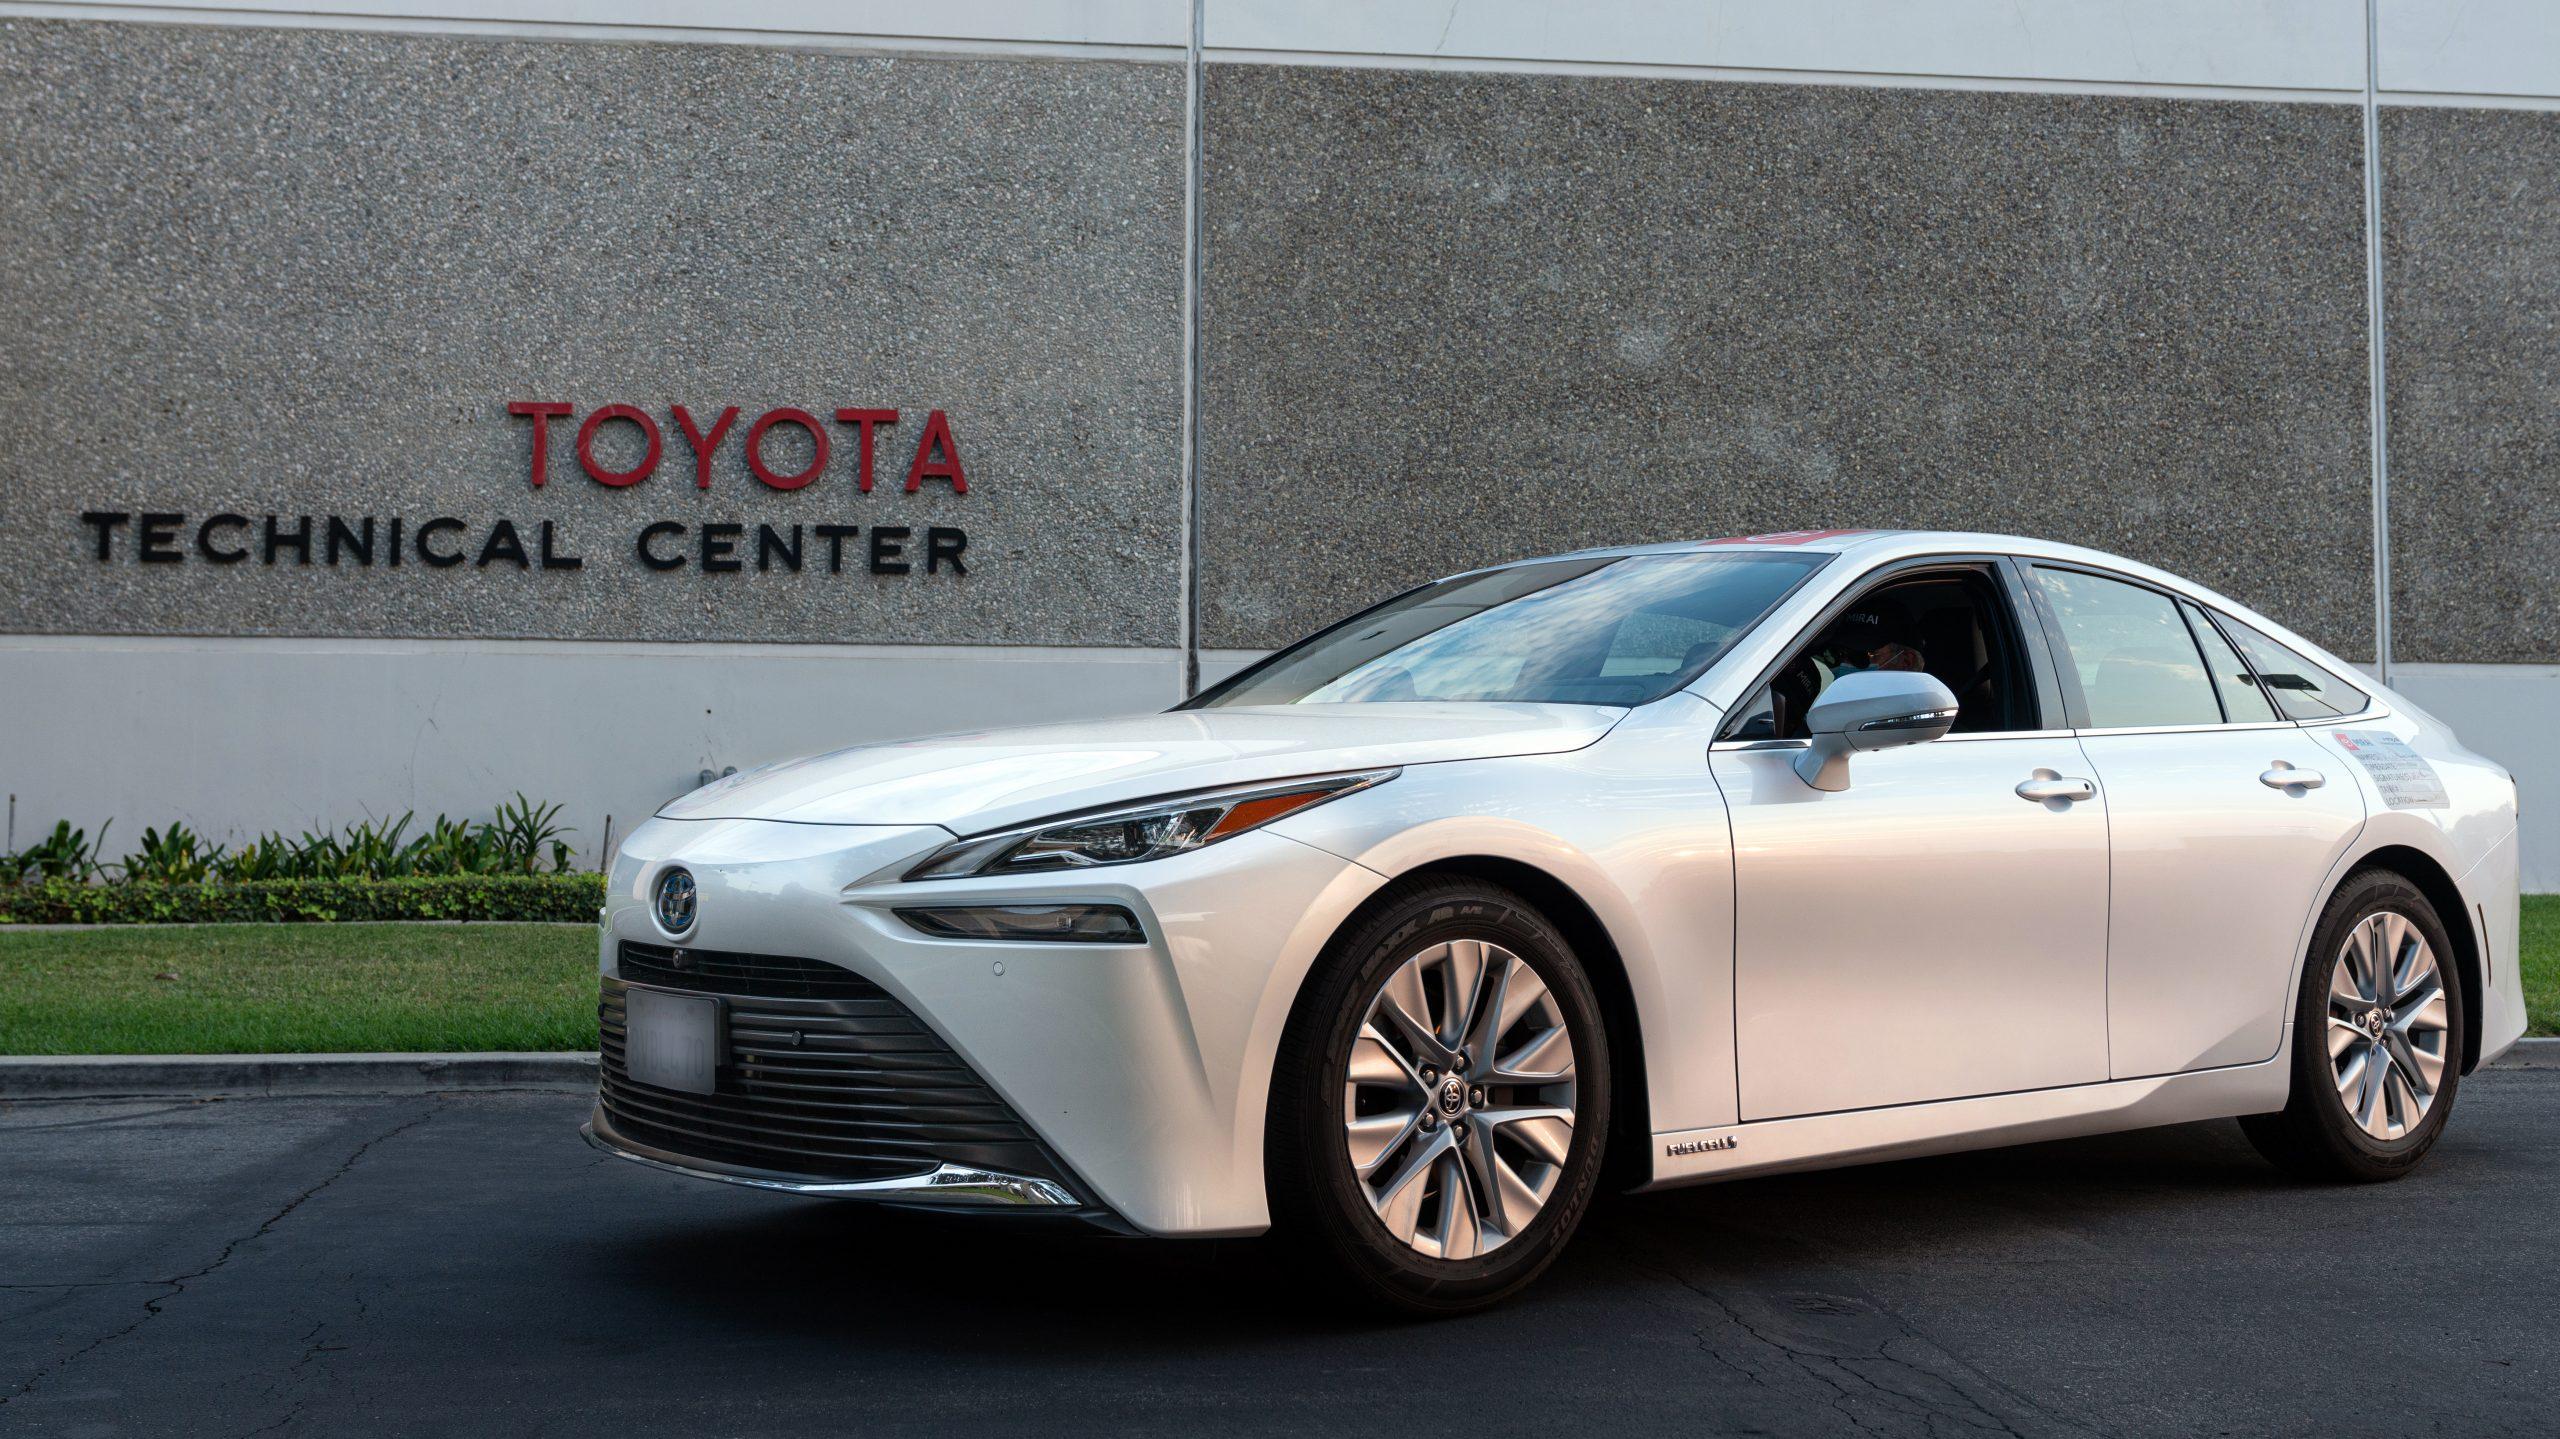 Toyota'dan Guinness rekoru